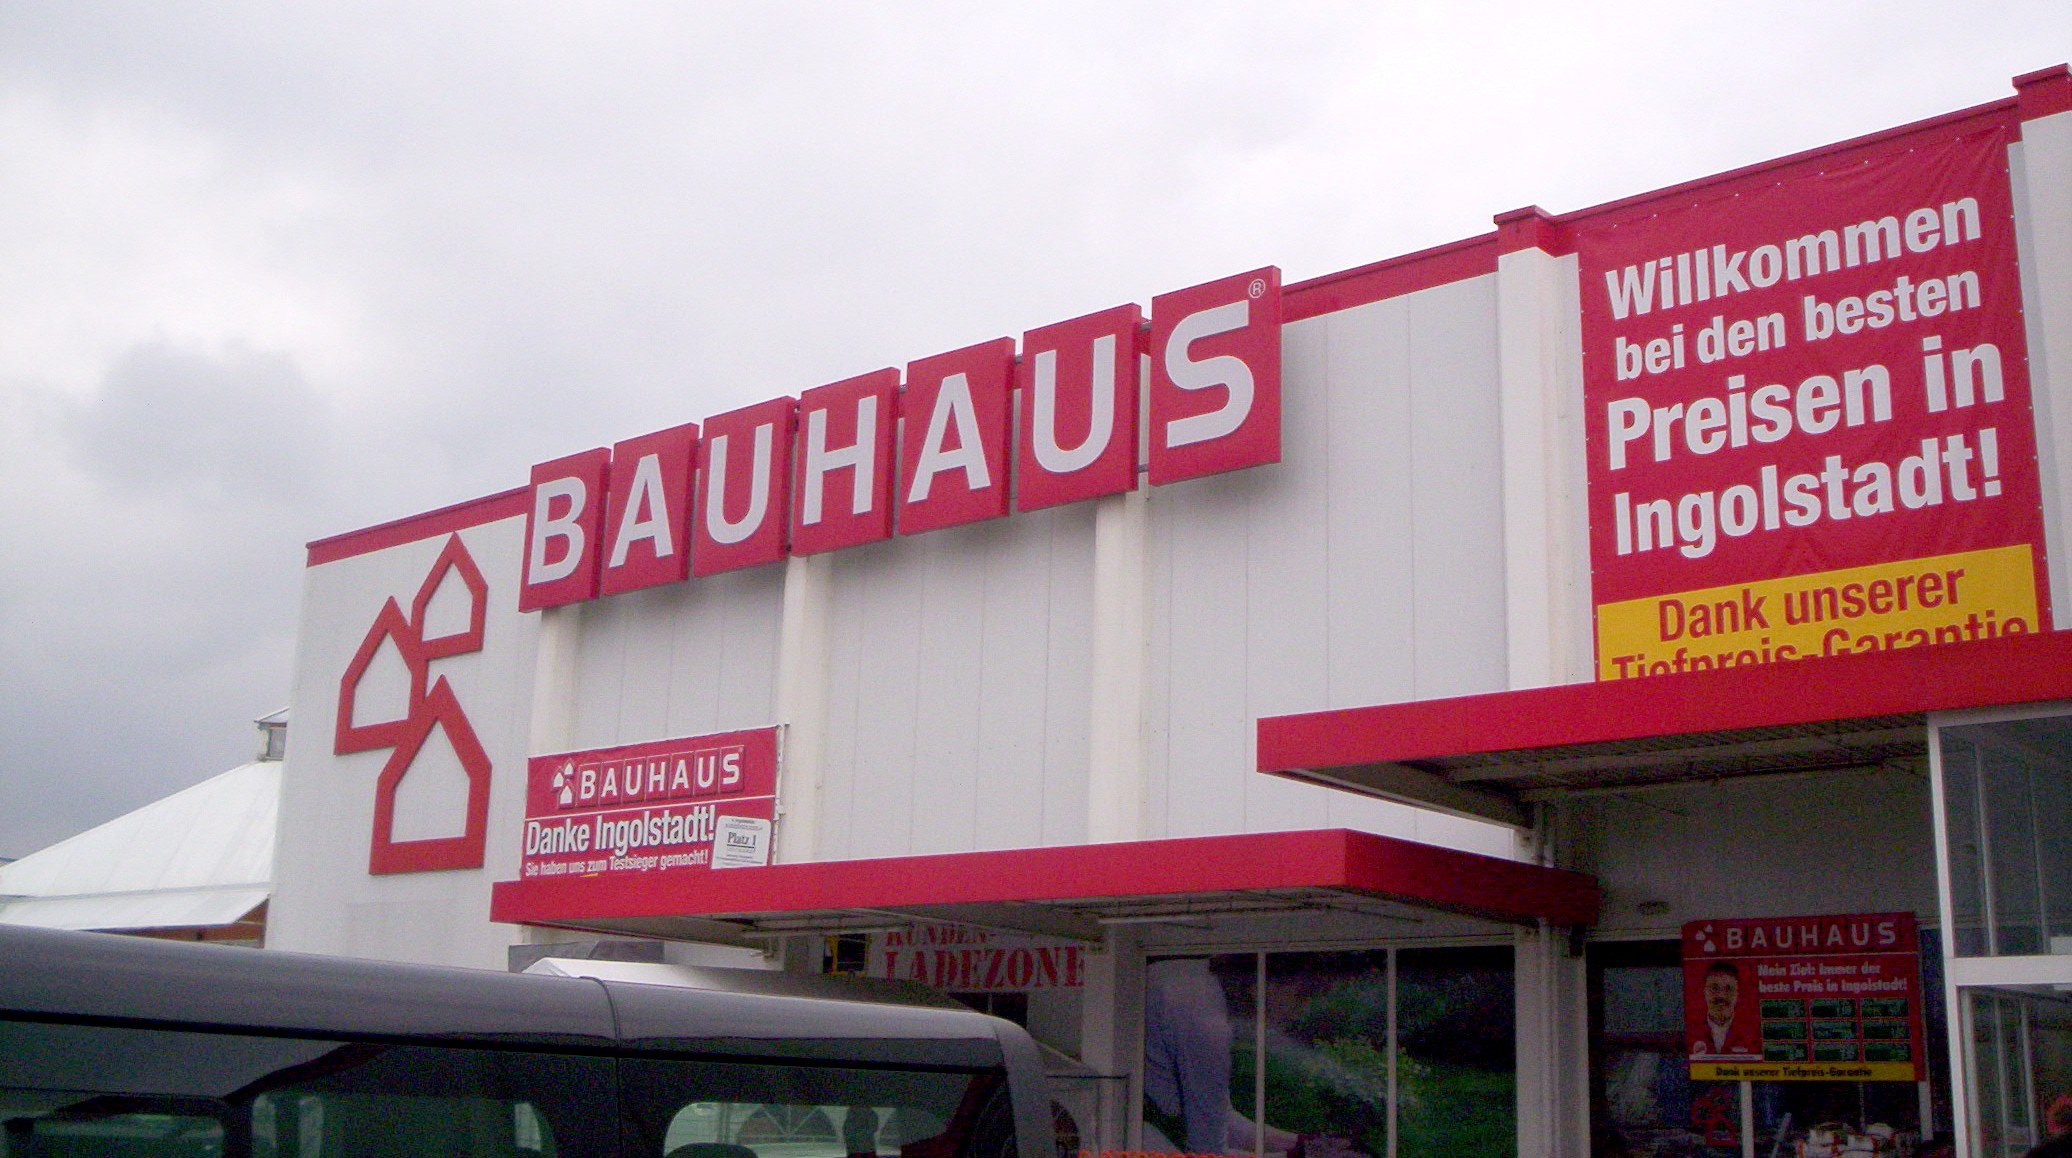 Bauhaus Company